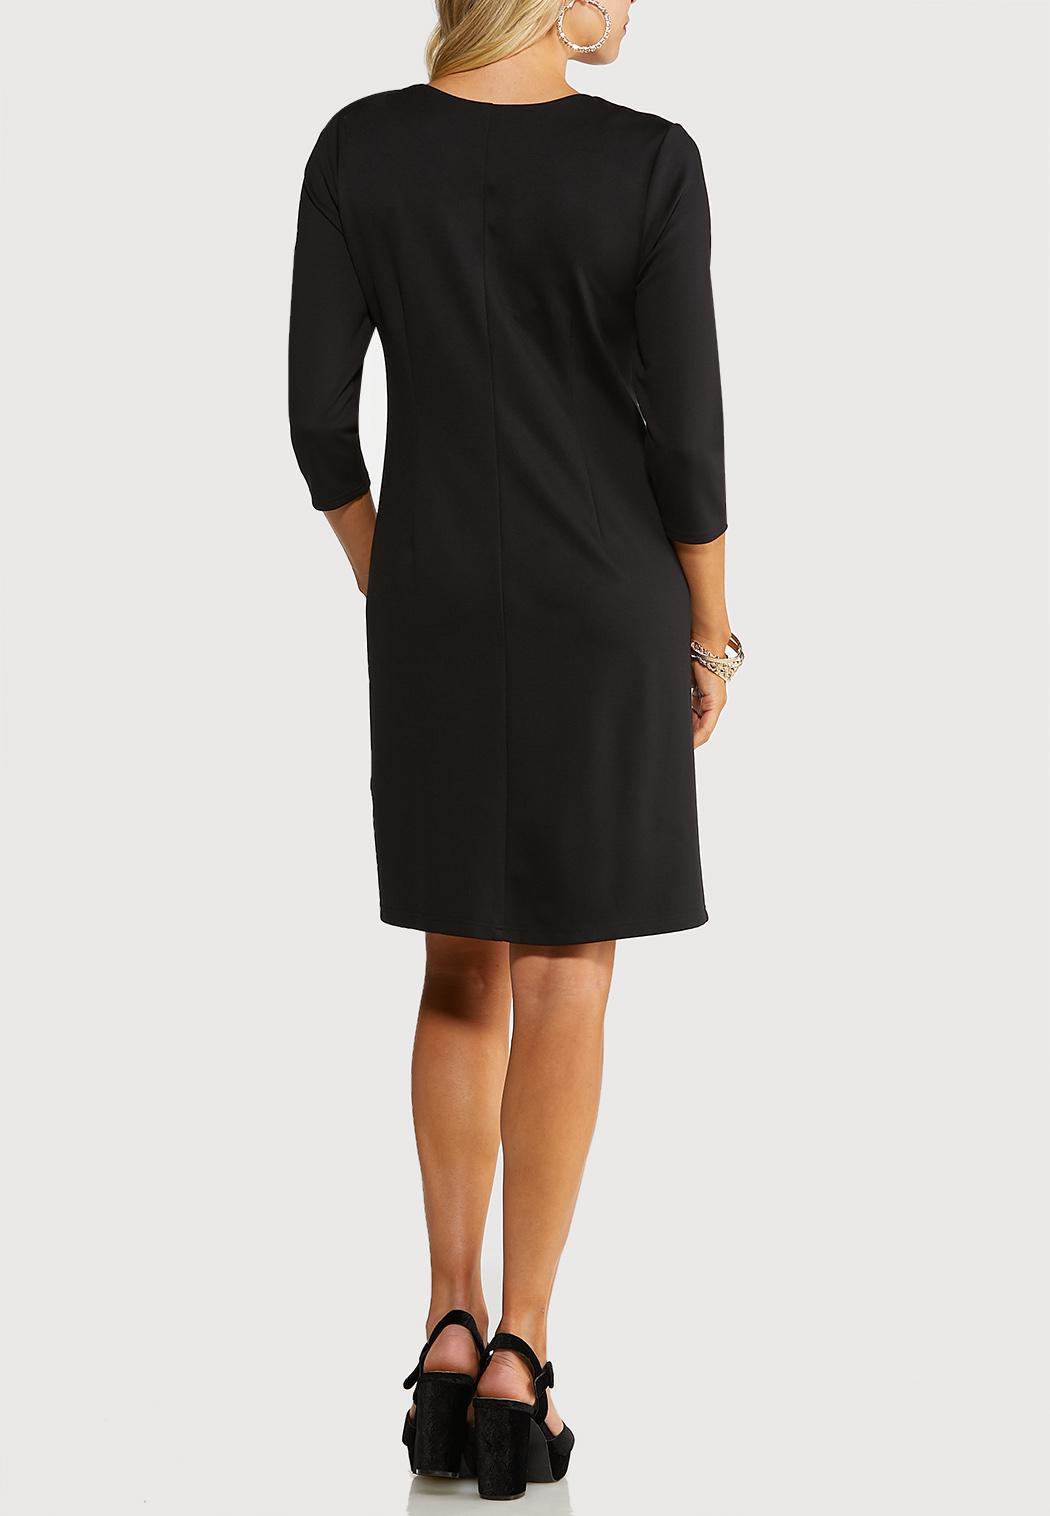 Grommet Ponte Dress (Item #44052376)